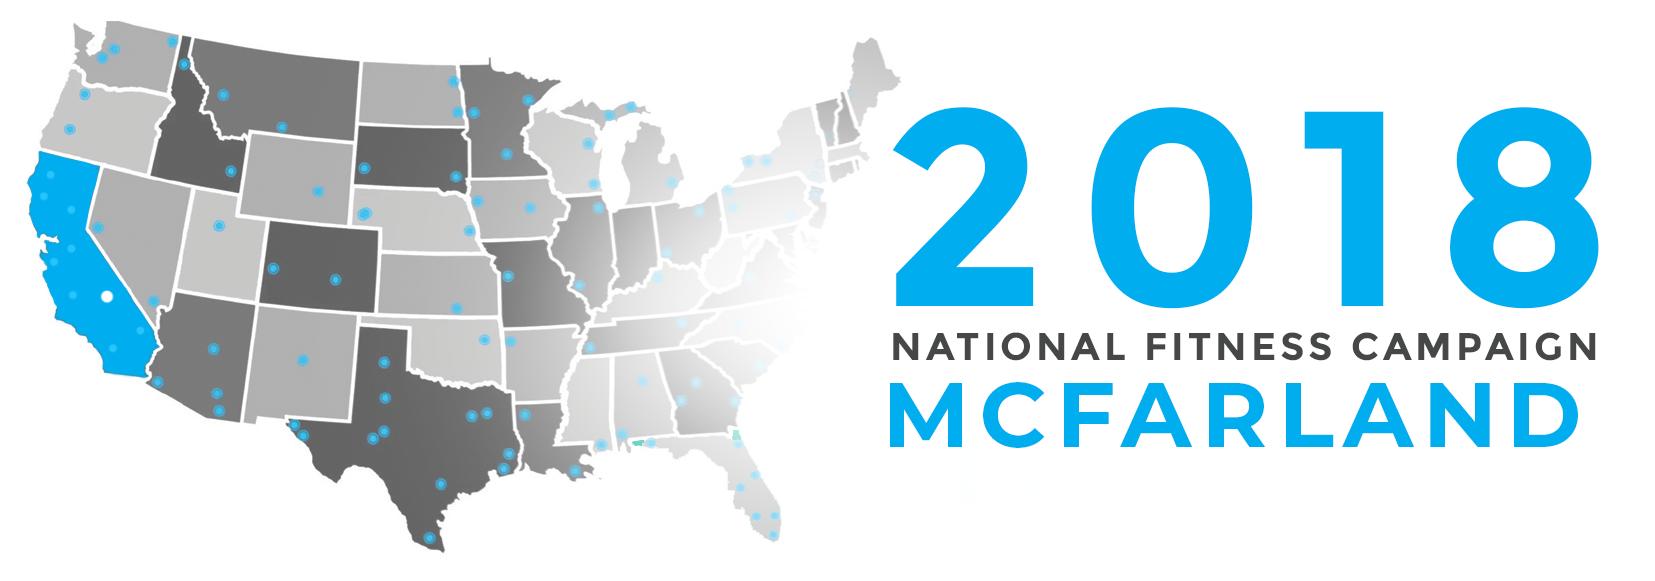 2018 Campaign Logo McFarland.png